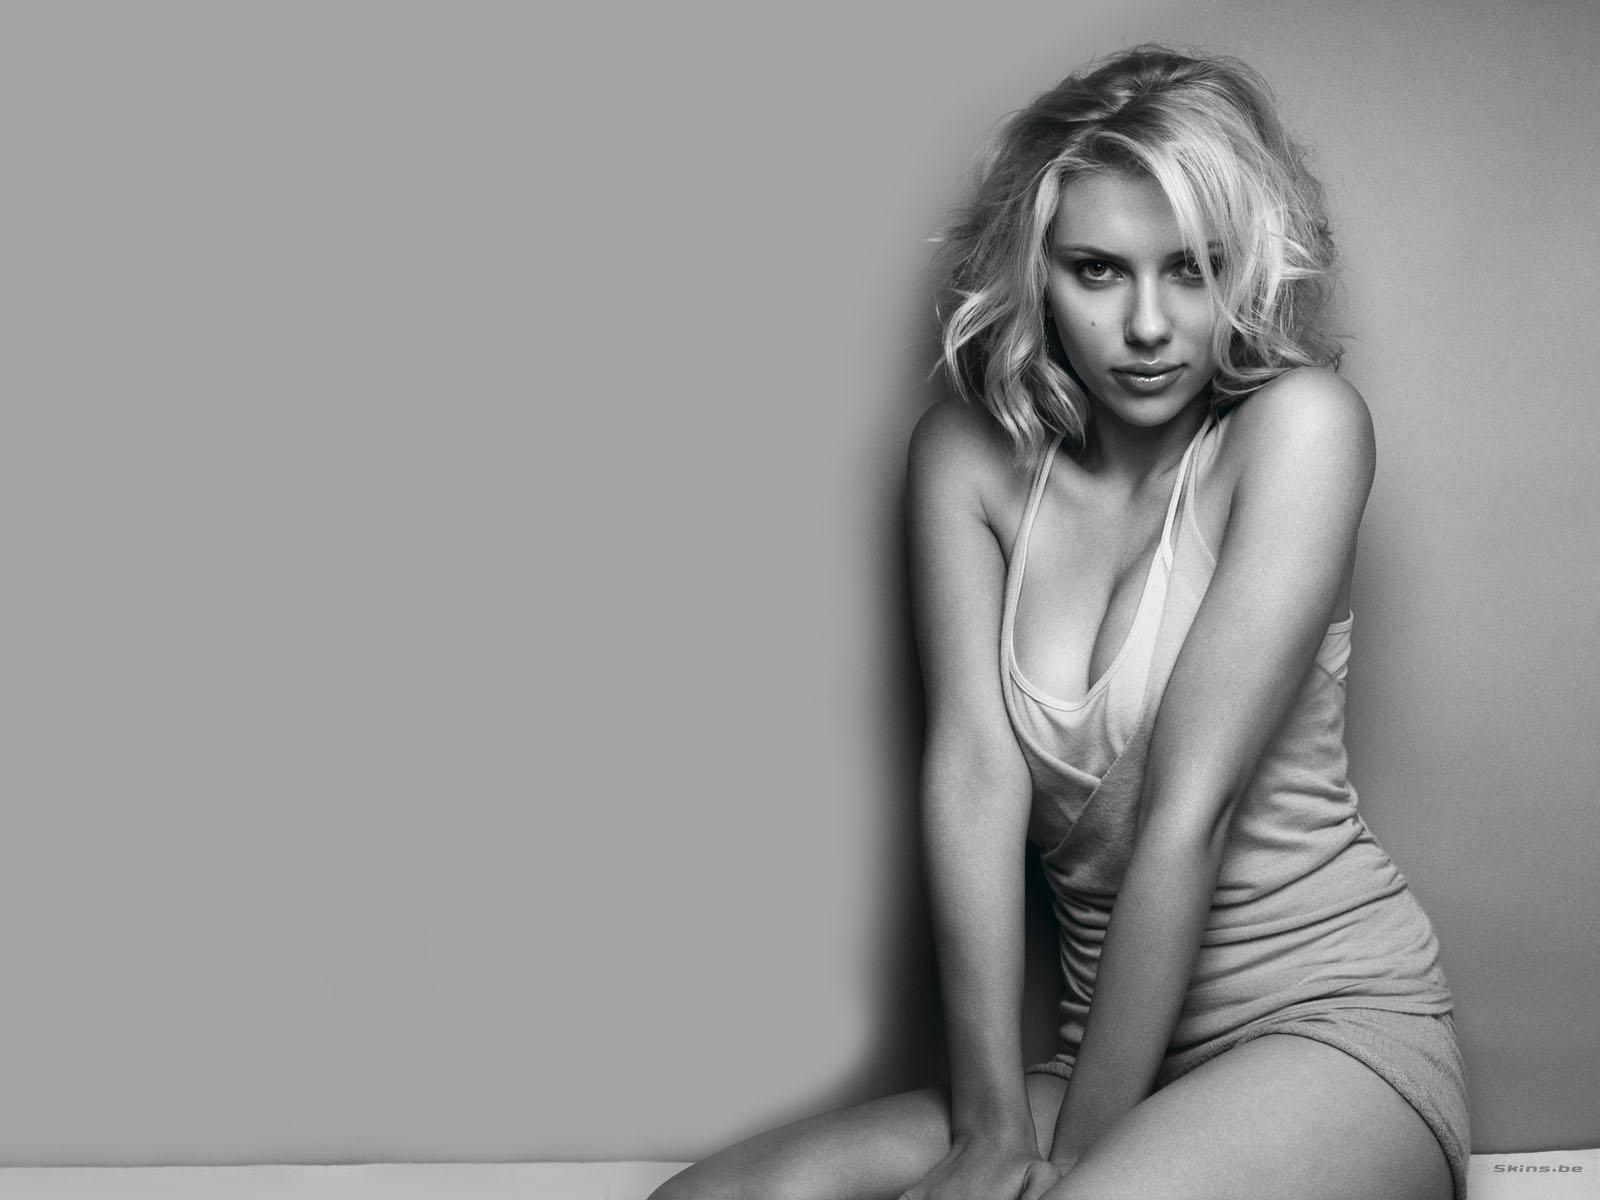 http://4.bp.blogspot.com/_GCAuqodmOE4/S_SabKPht_I/AAAAAAAAA5o/63PecjTgPkw/s1600/Scarlett+Johansson_0.jpg